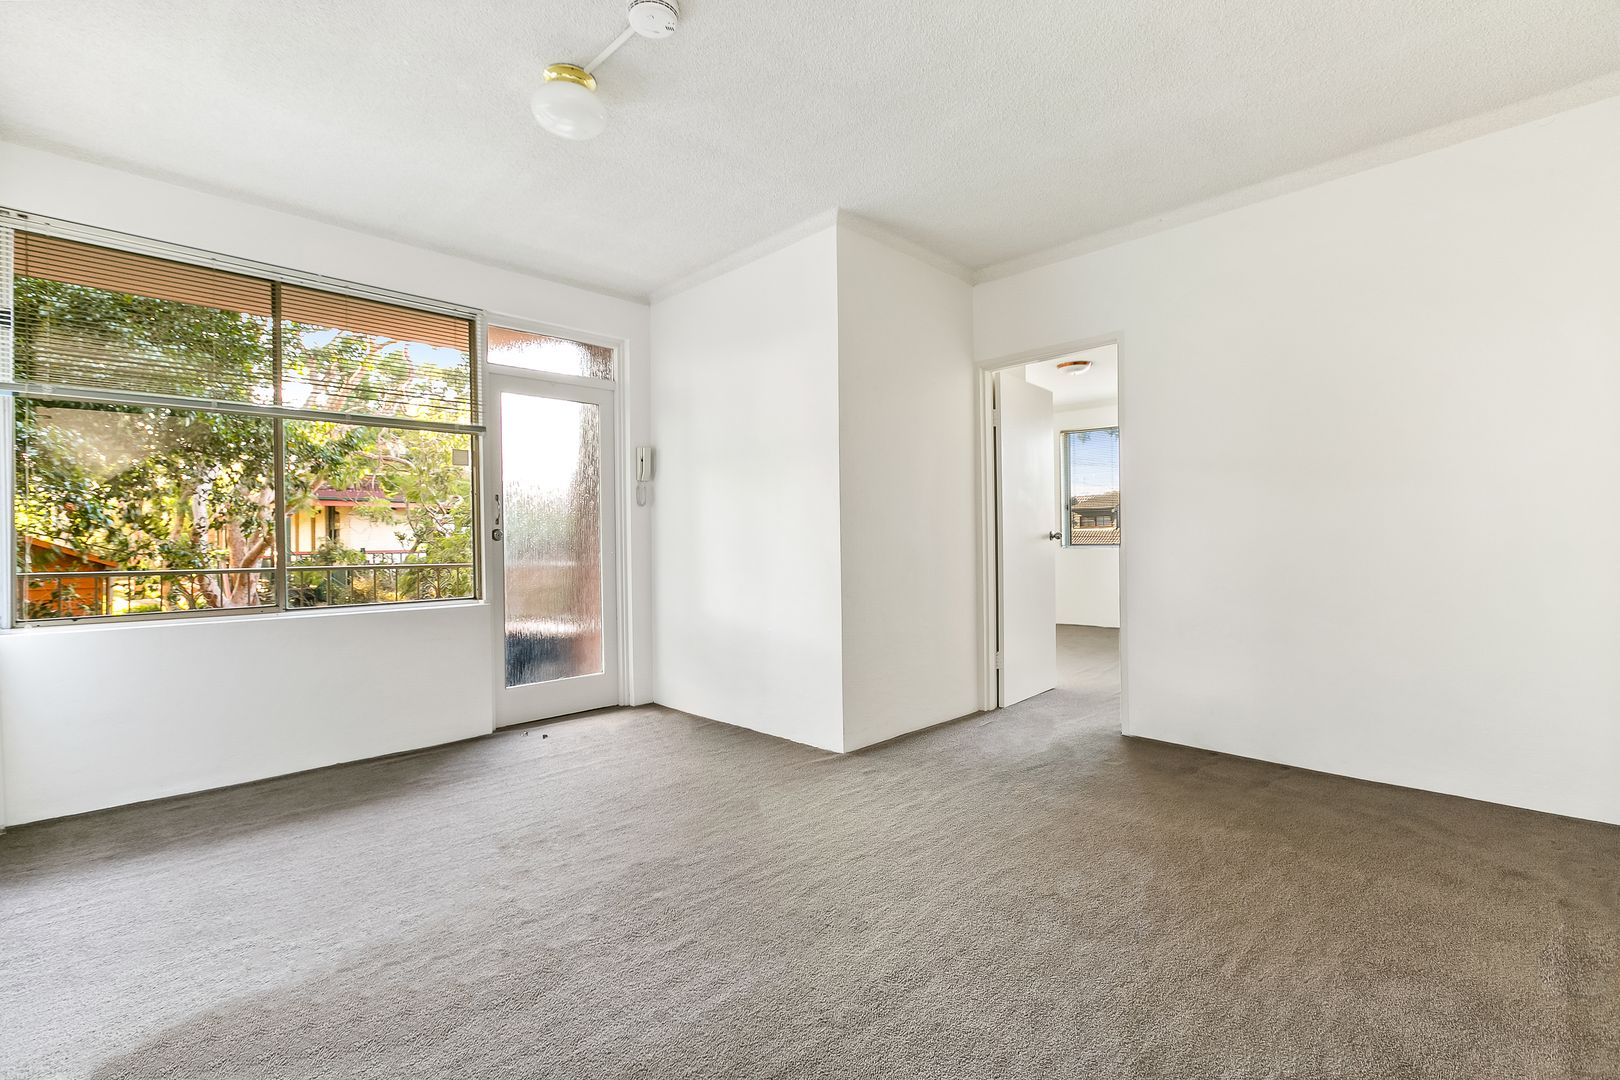 3/1-3 Morden Street, Cammeray NSW 2062, Image 1